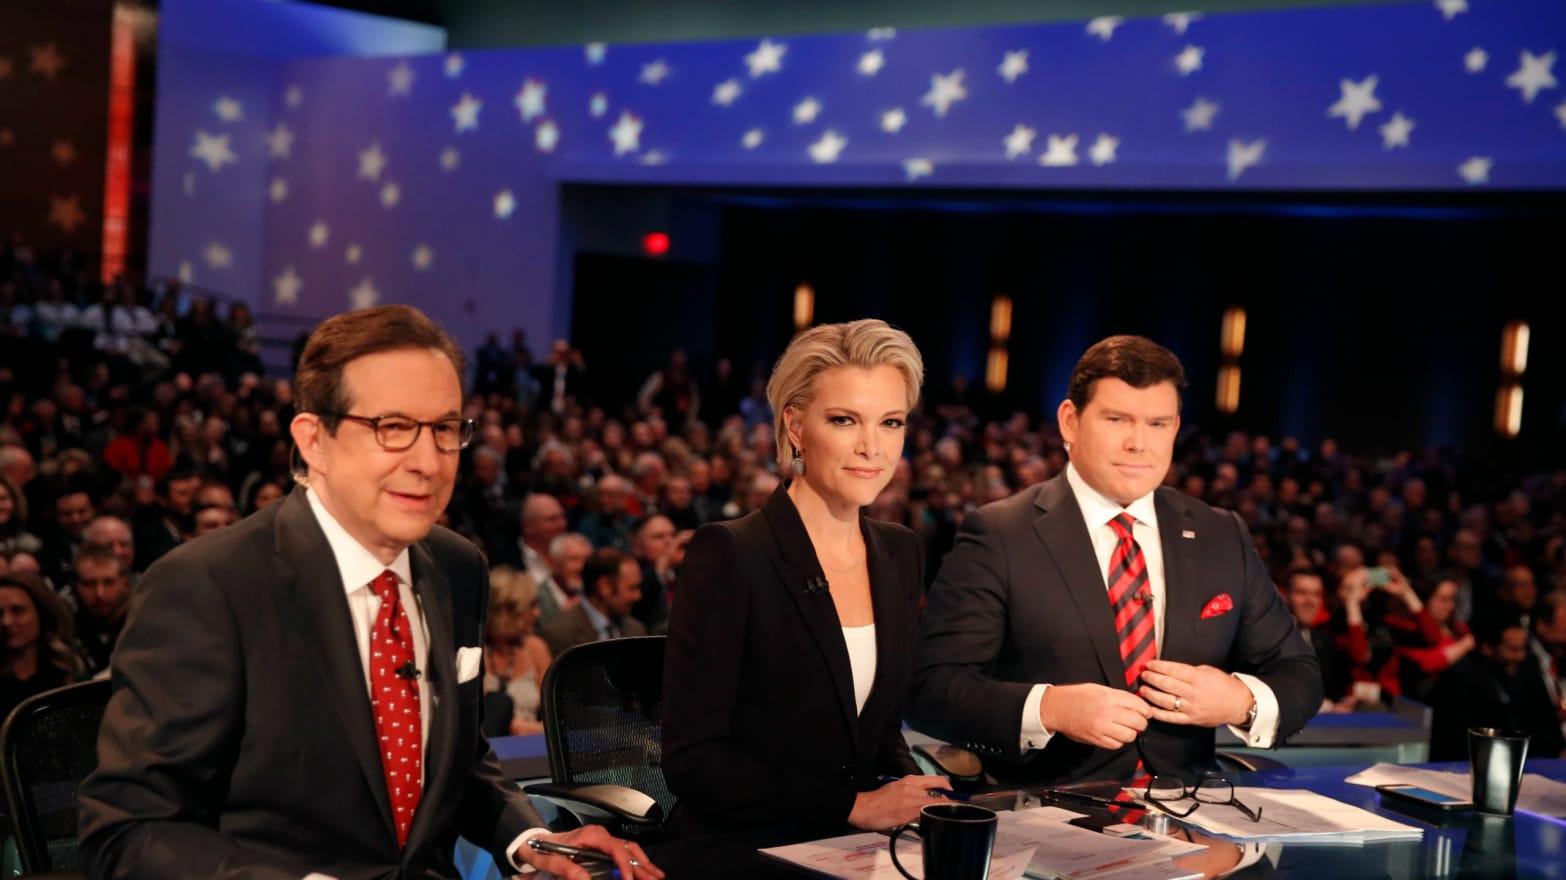 How to Watch Thursday's Fox News Republican Debate Live